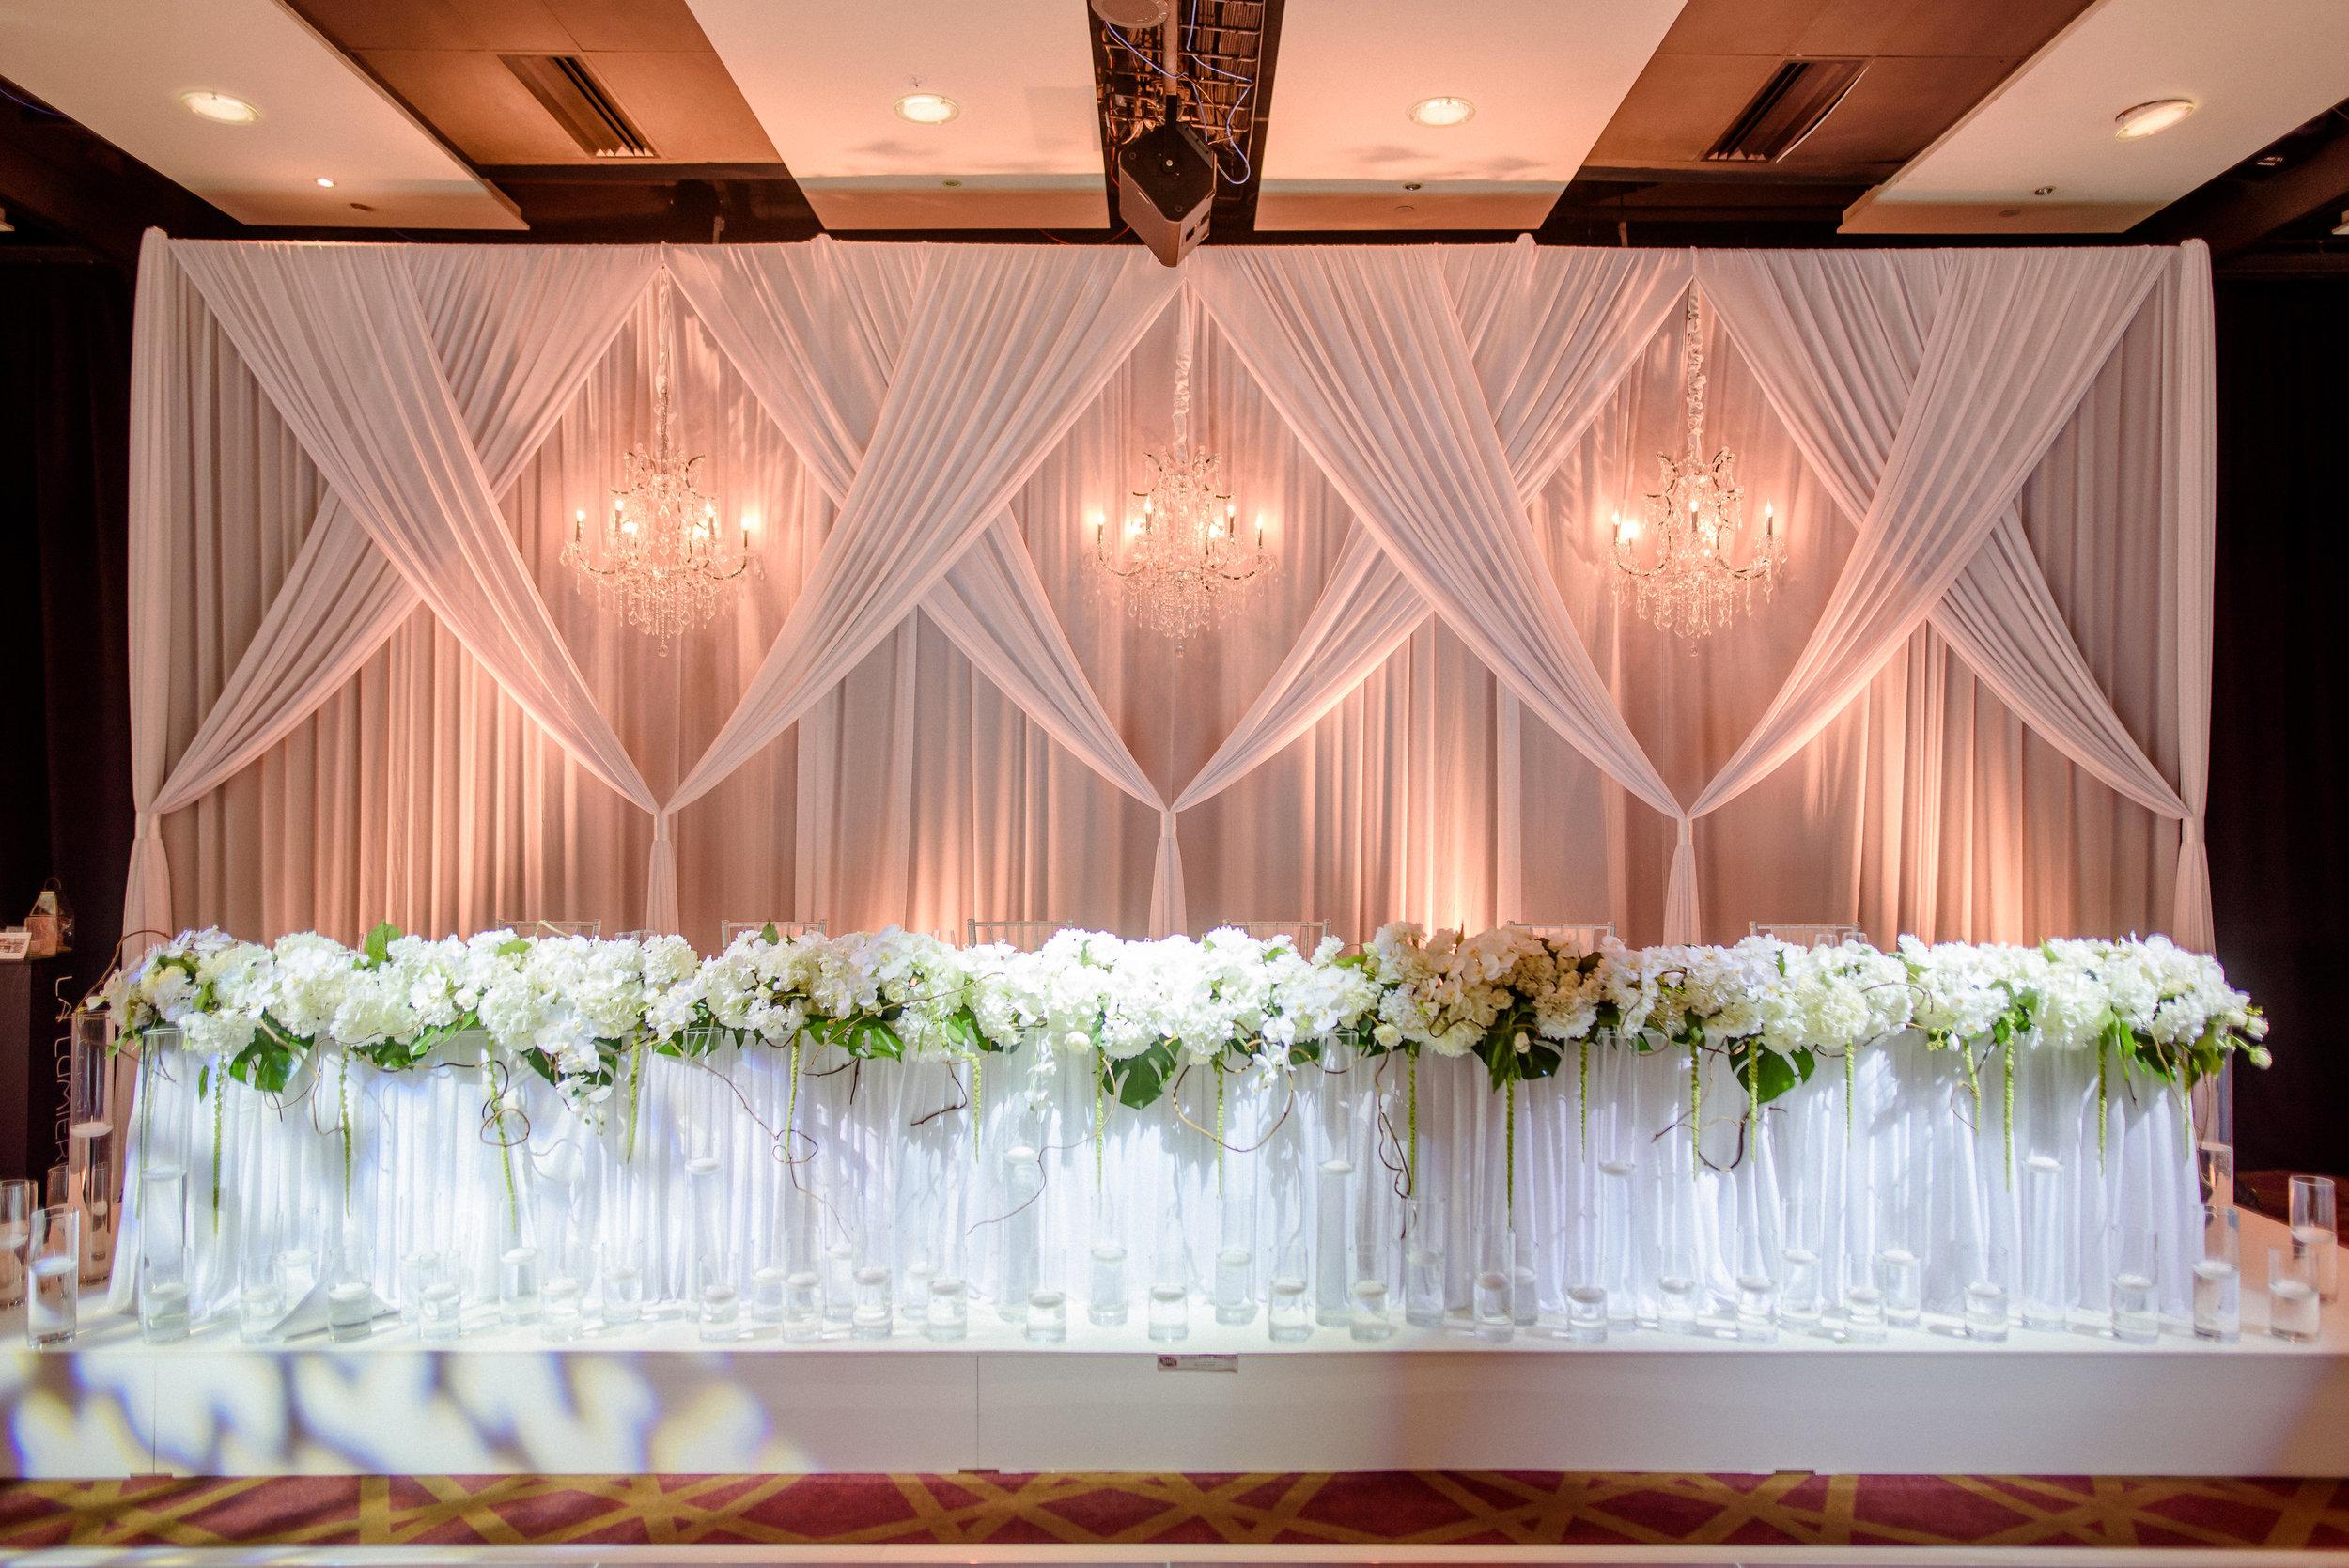 bespoke draped backdrop with chandeliers